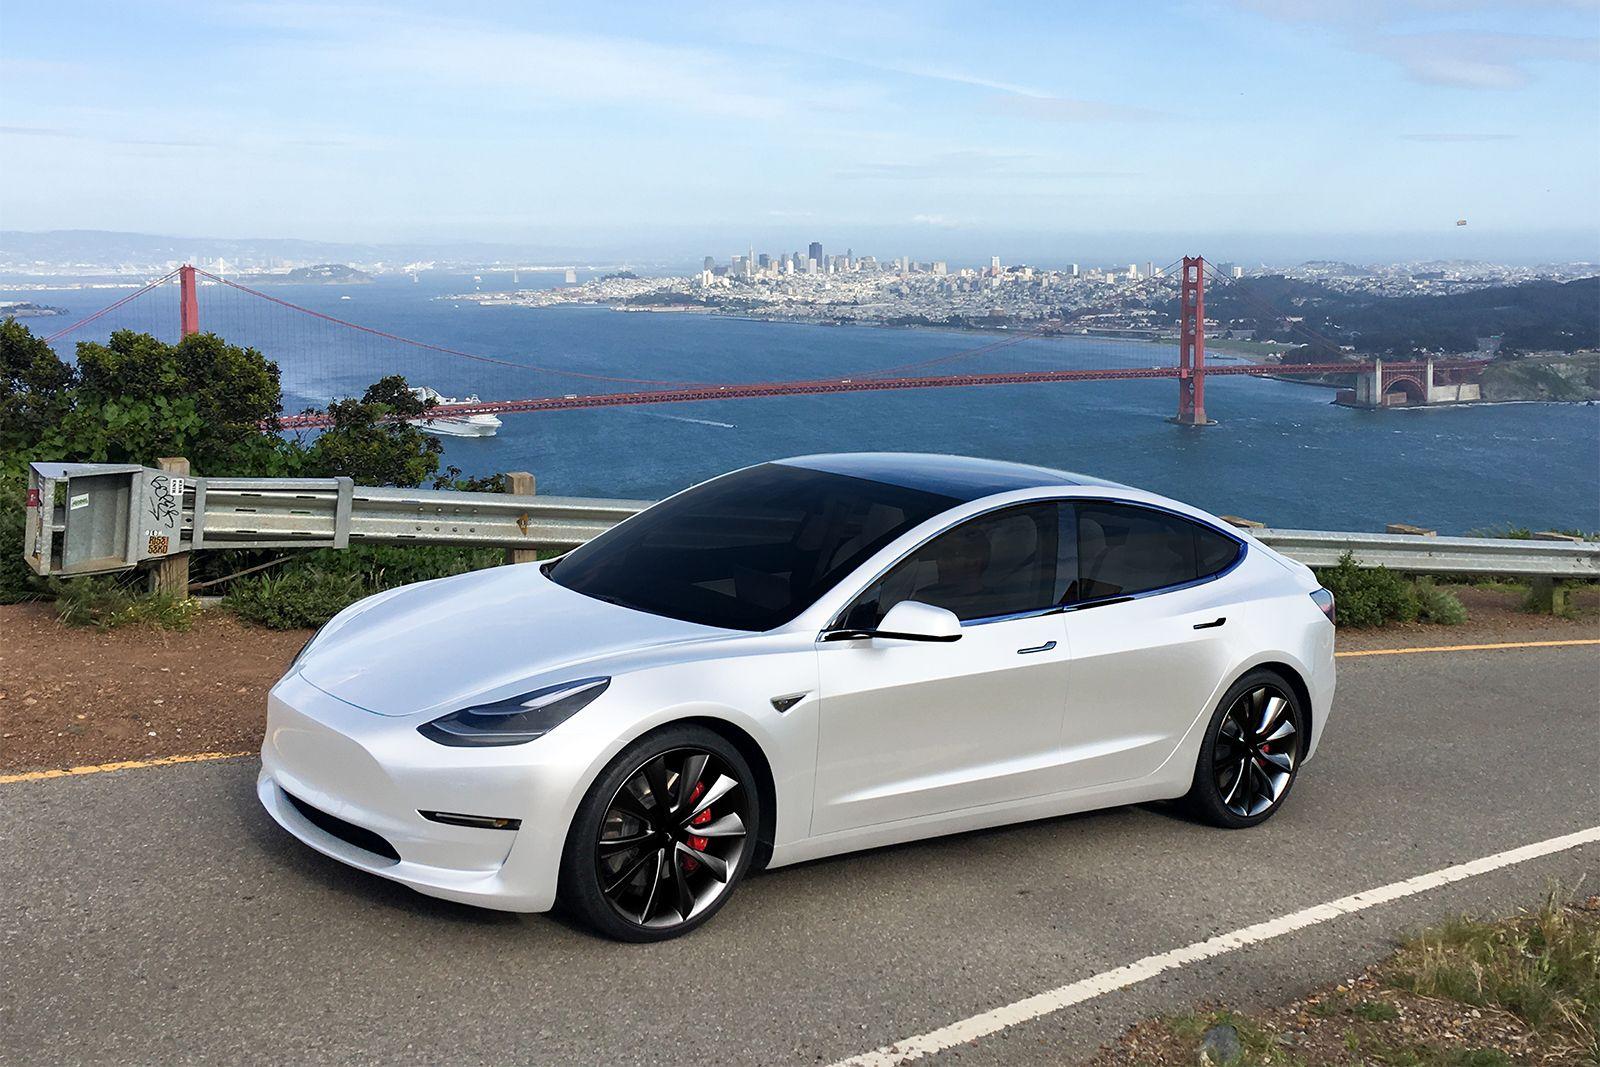 (Tesla Model 3) (35K) Tesla model, Electric cars, Tesla car